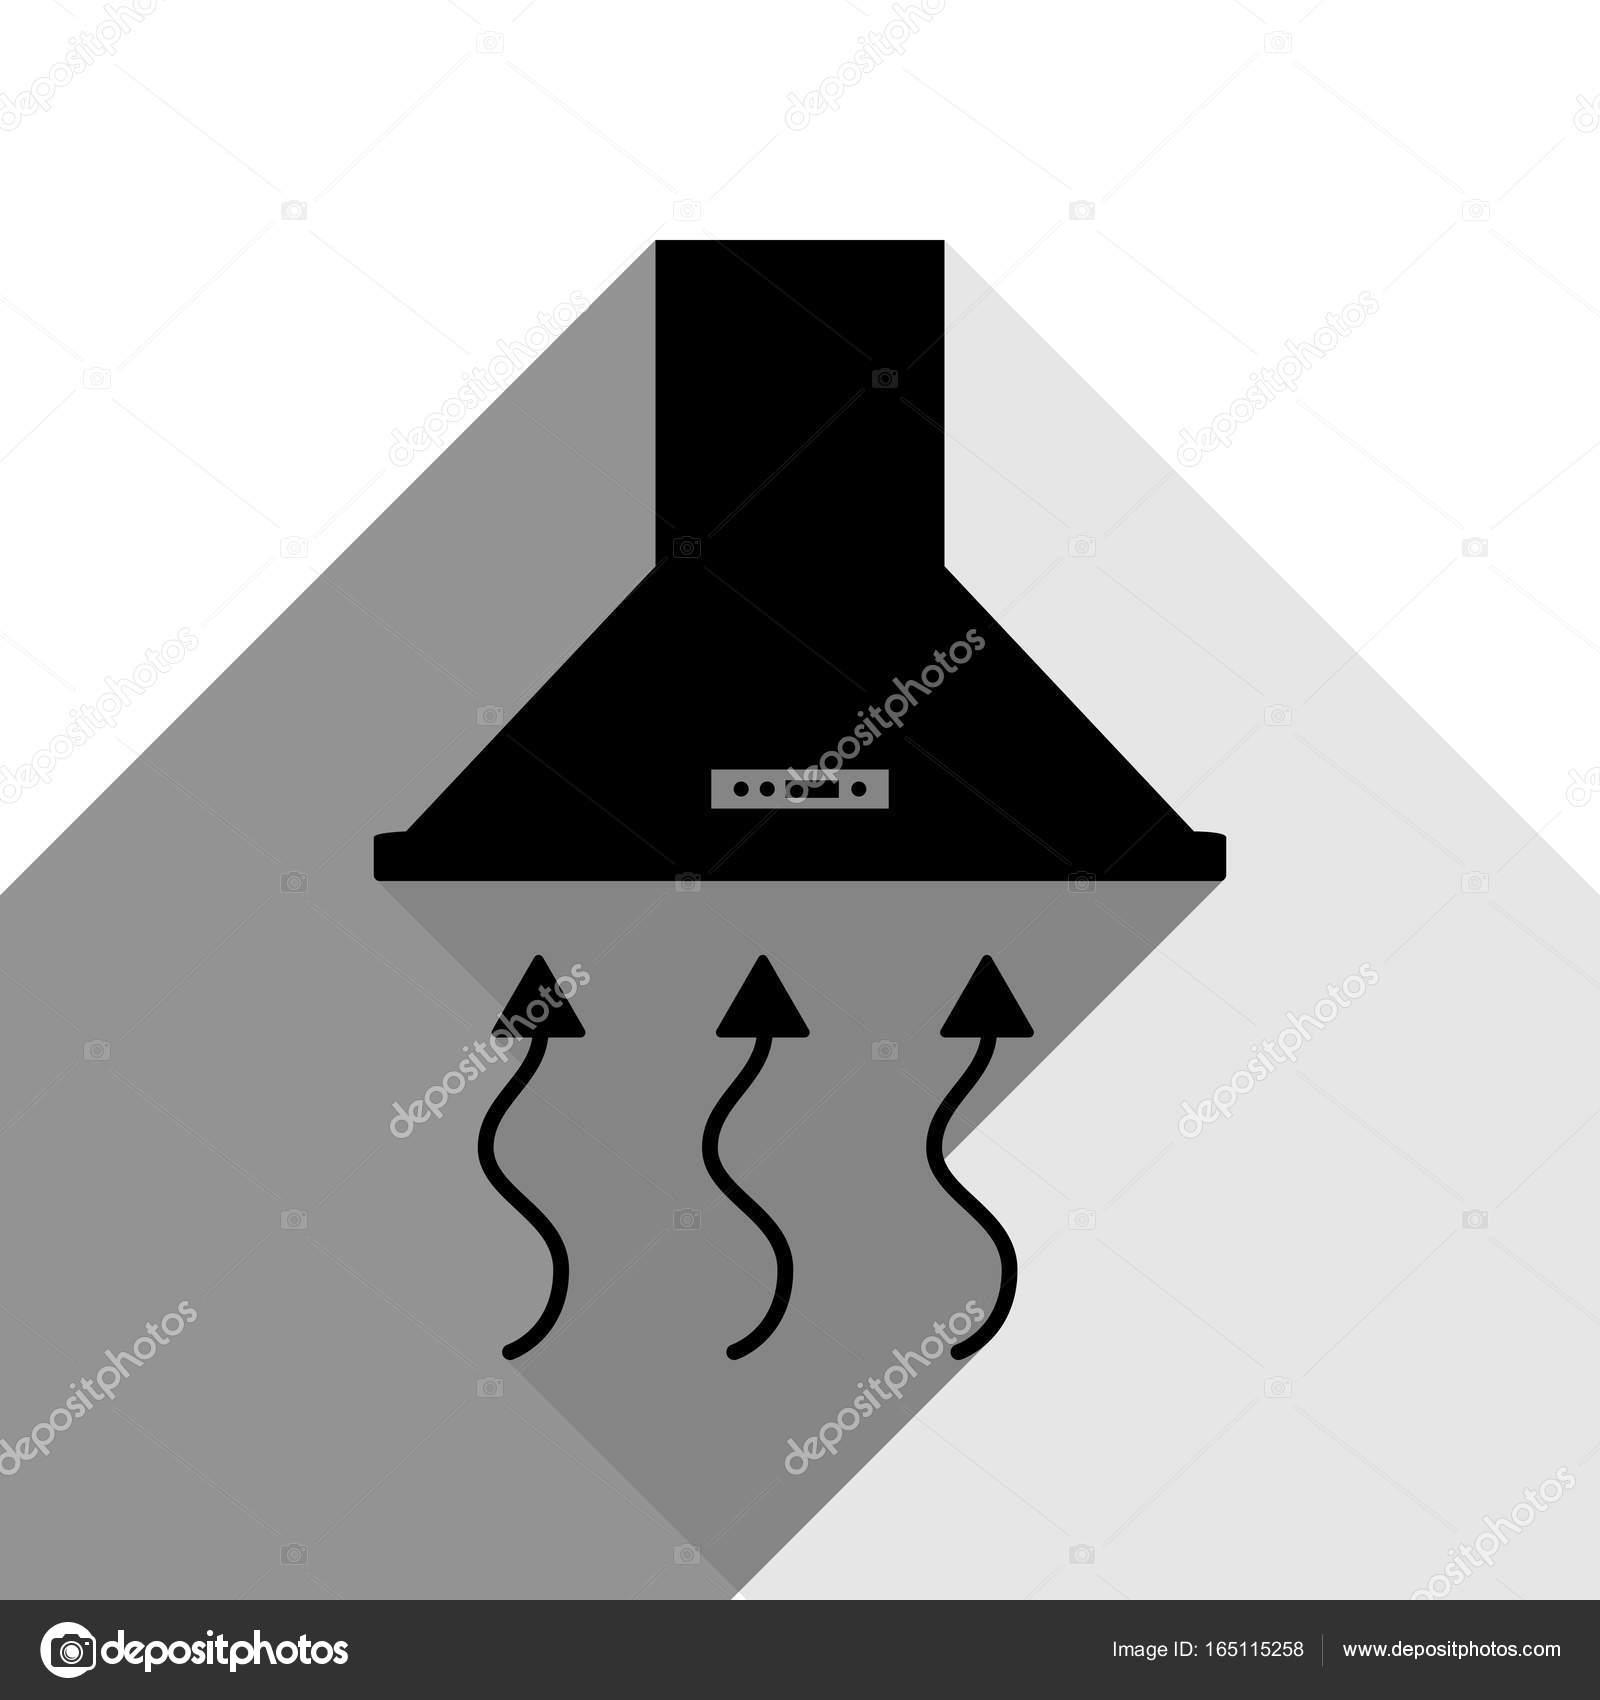 kitchen vent hood drop in farmhouse sinks 排风罩 脱排油烟机 厨房通风标志 矢量 有两个扁平的灰色阴影 白色 有